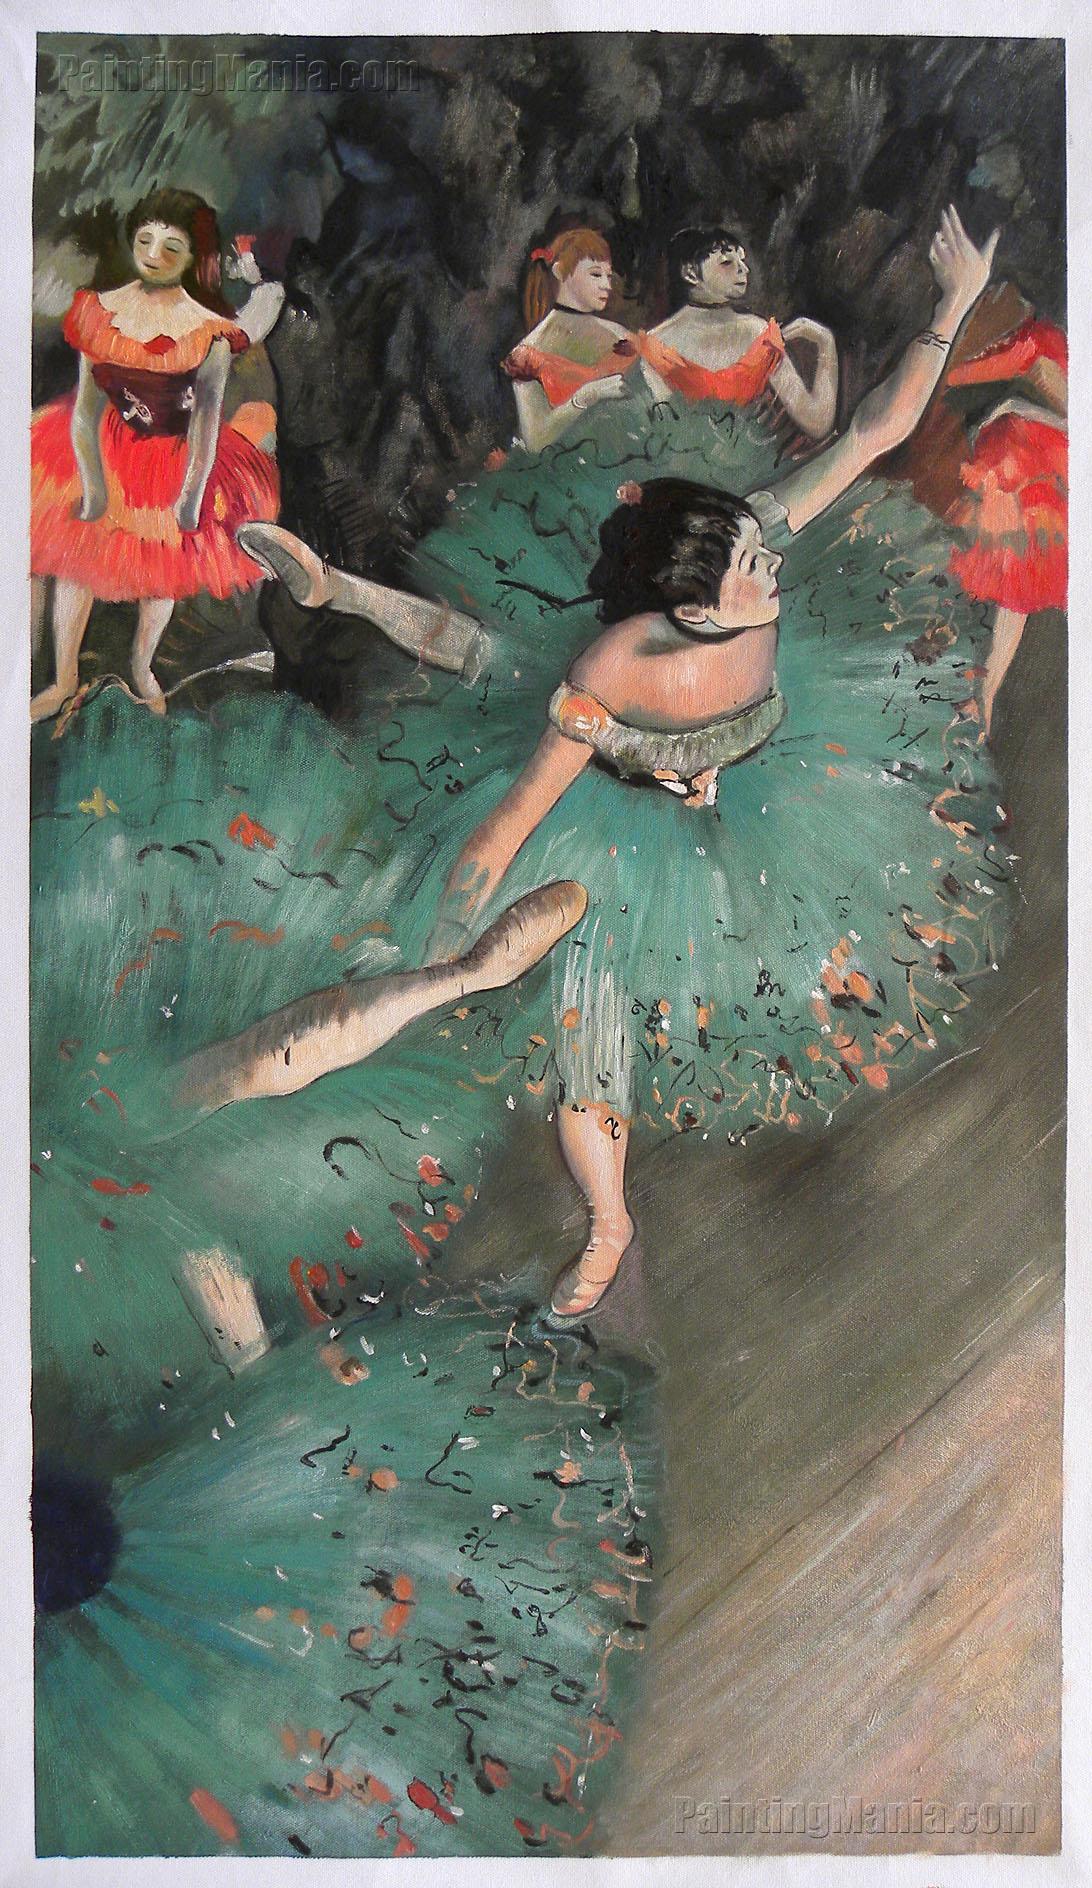 The Green Dancer